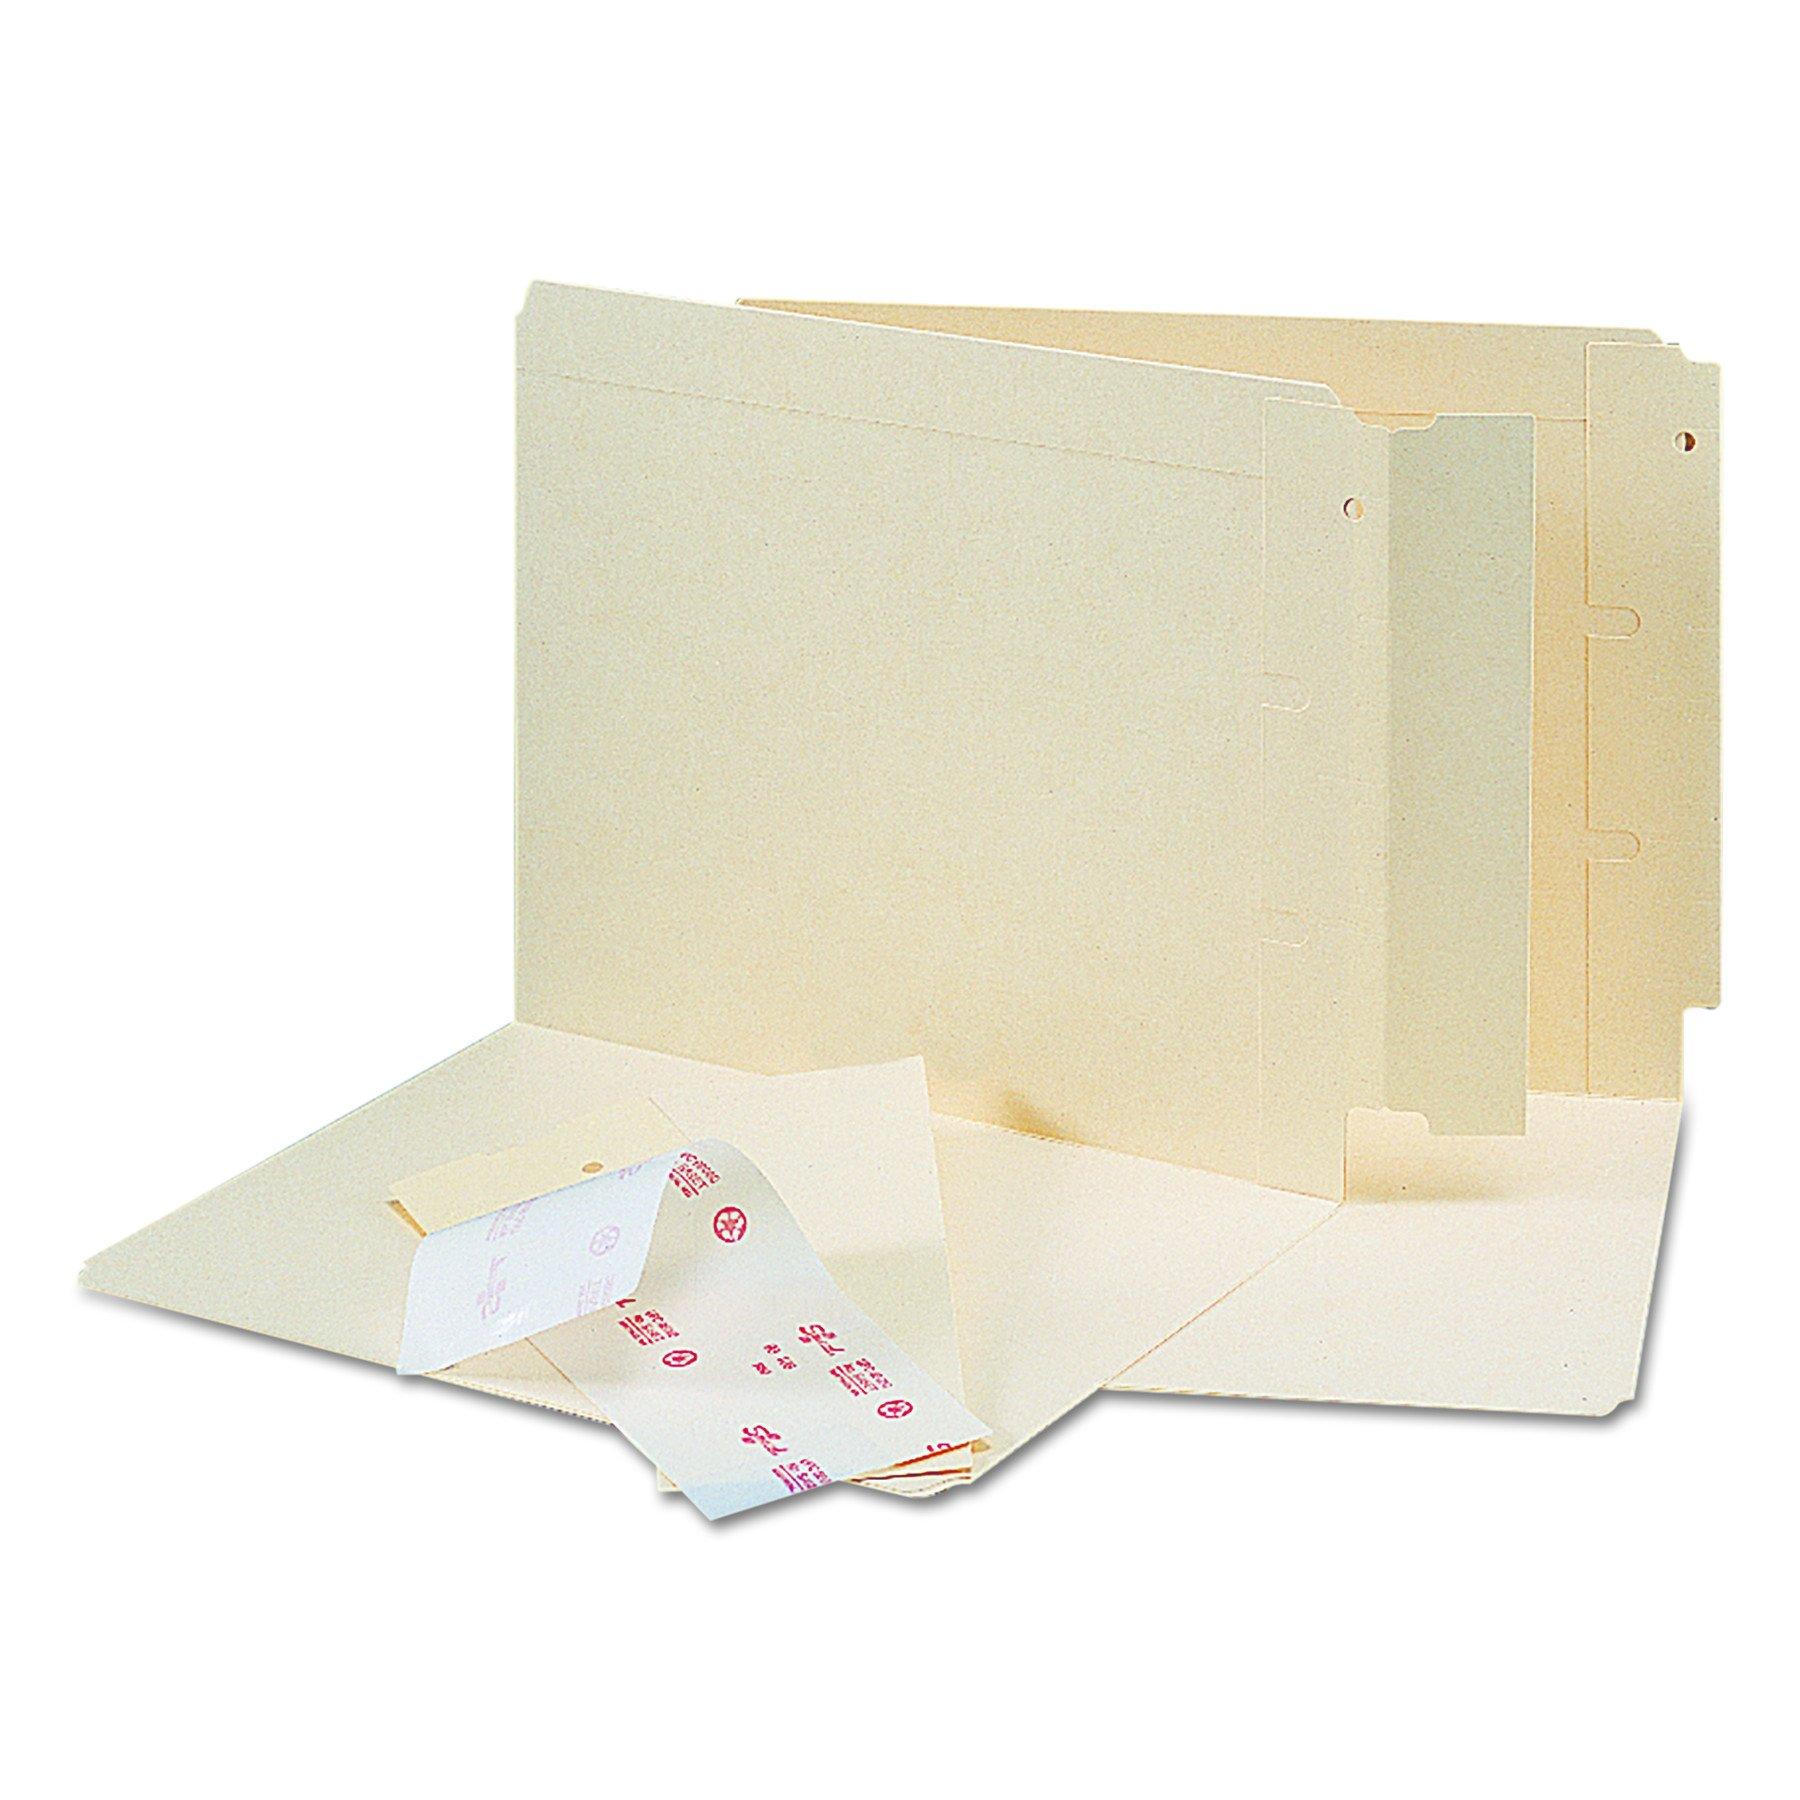 Smead Folder End Tab Converter, Reinforced 8'' High Tab, Letter/Legal, Manila, 500 per Box (68080) by Smead (Image #1)